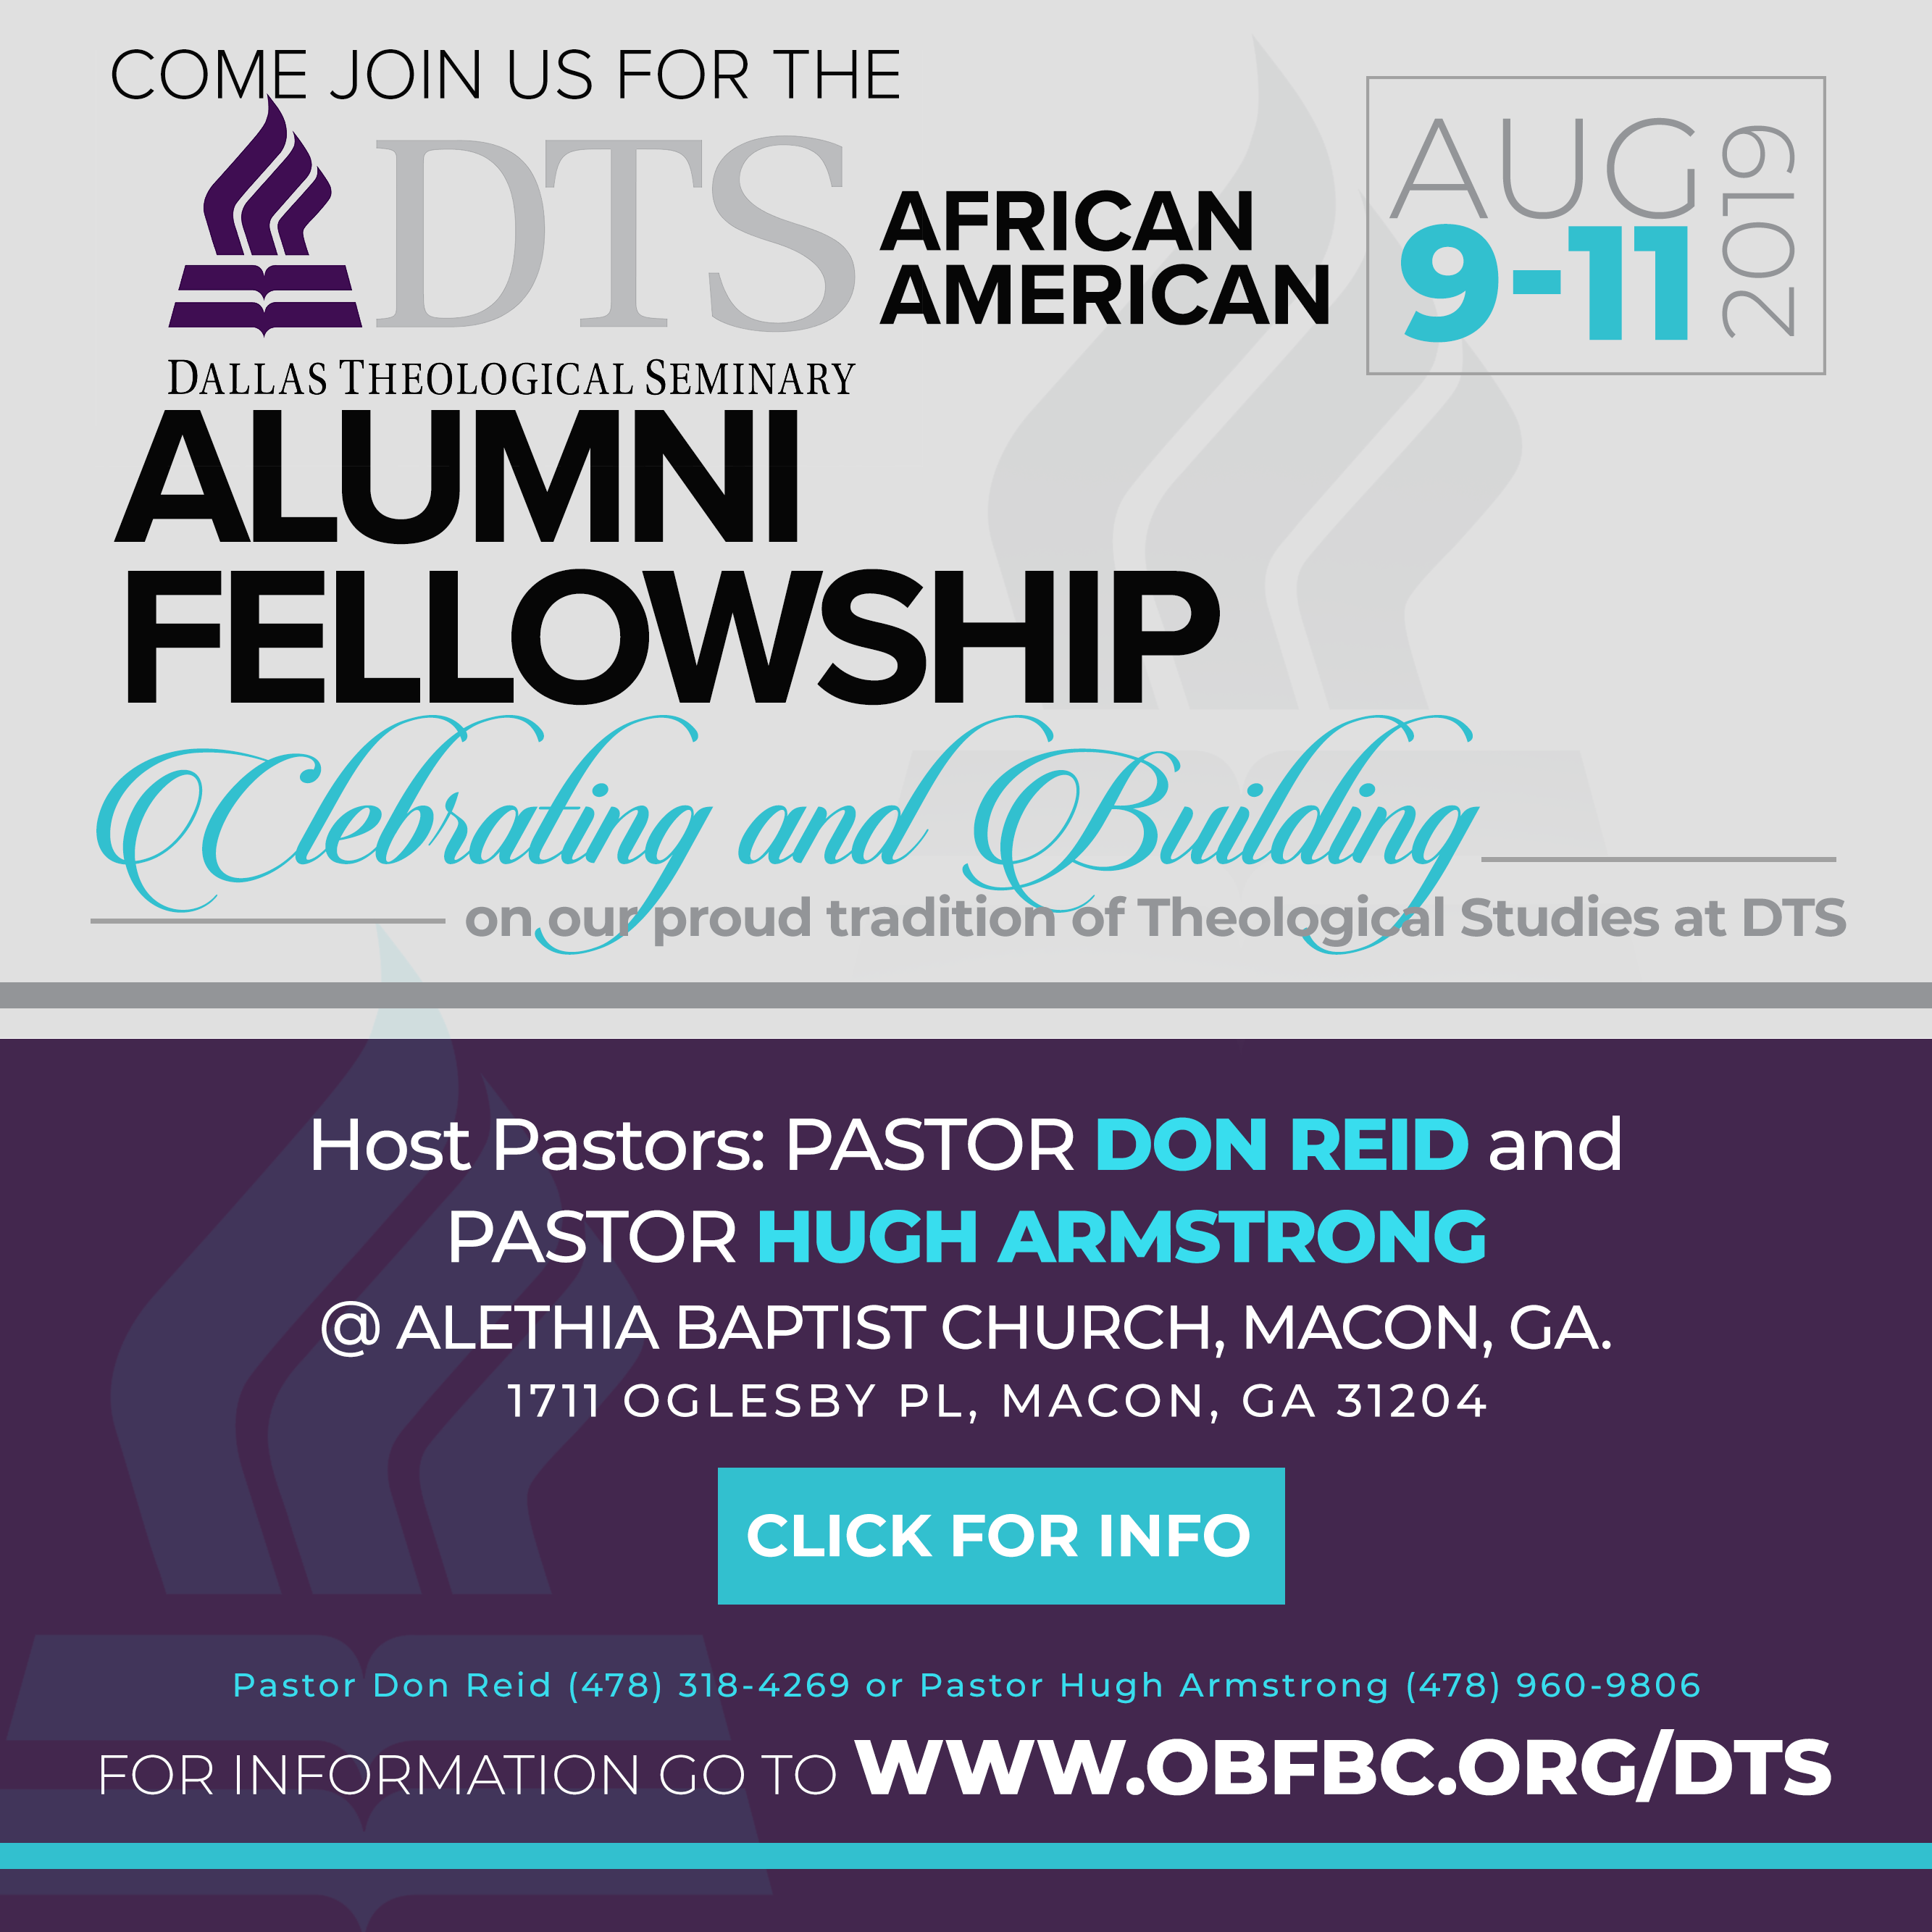 https://www.obfbc.org/wp-content/uploads/2019/05/Alumni-fellowship-social-1.png